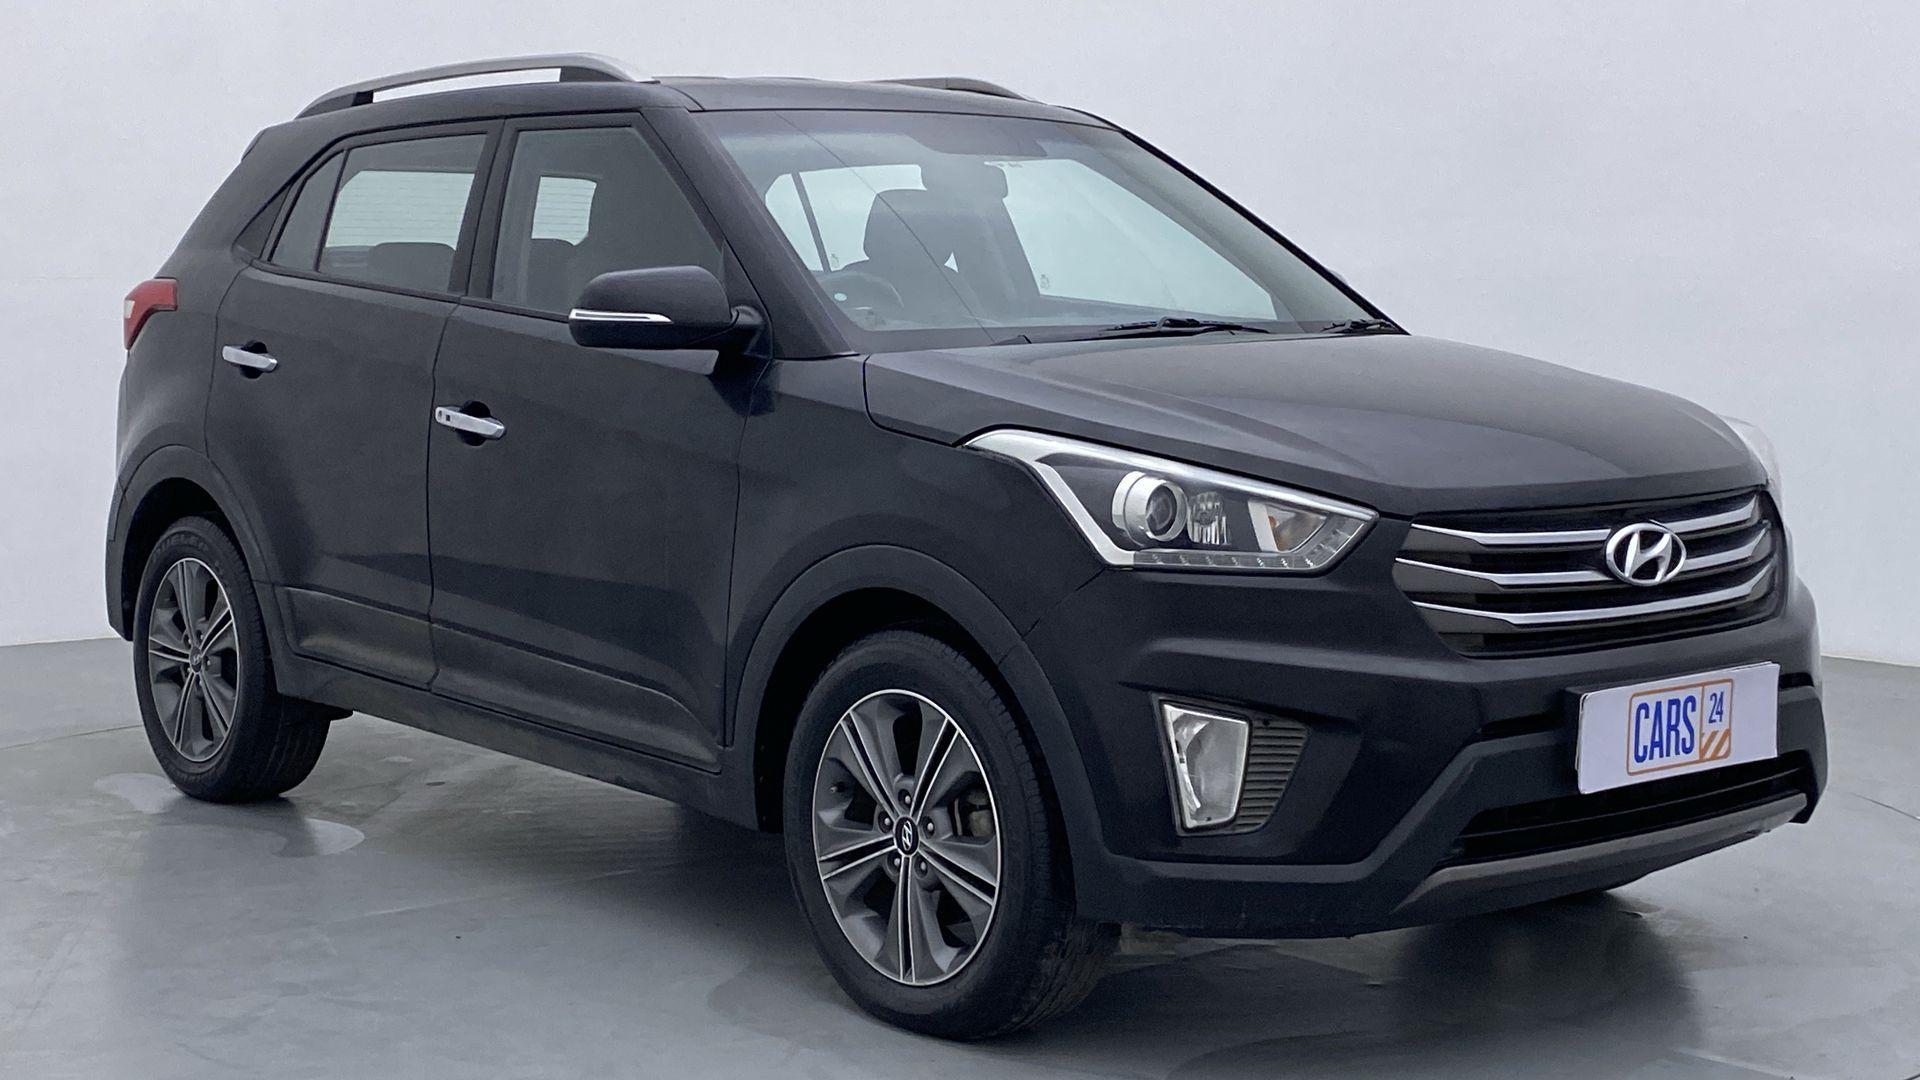 2016 Hyundai Creta 1.6 SX AT CRDI